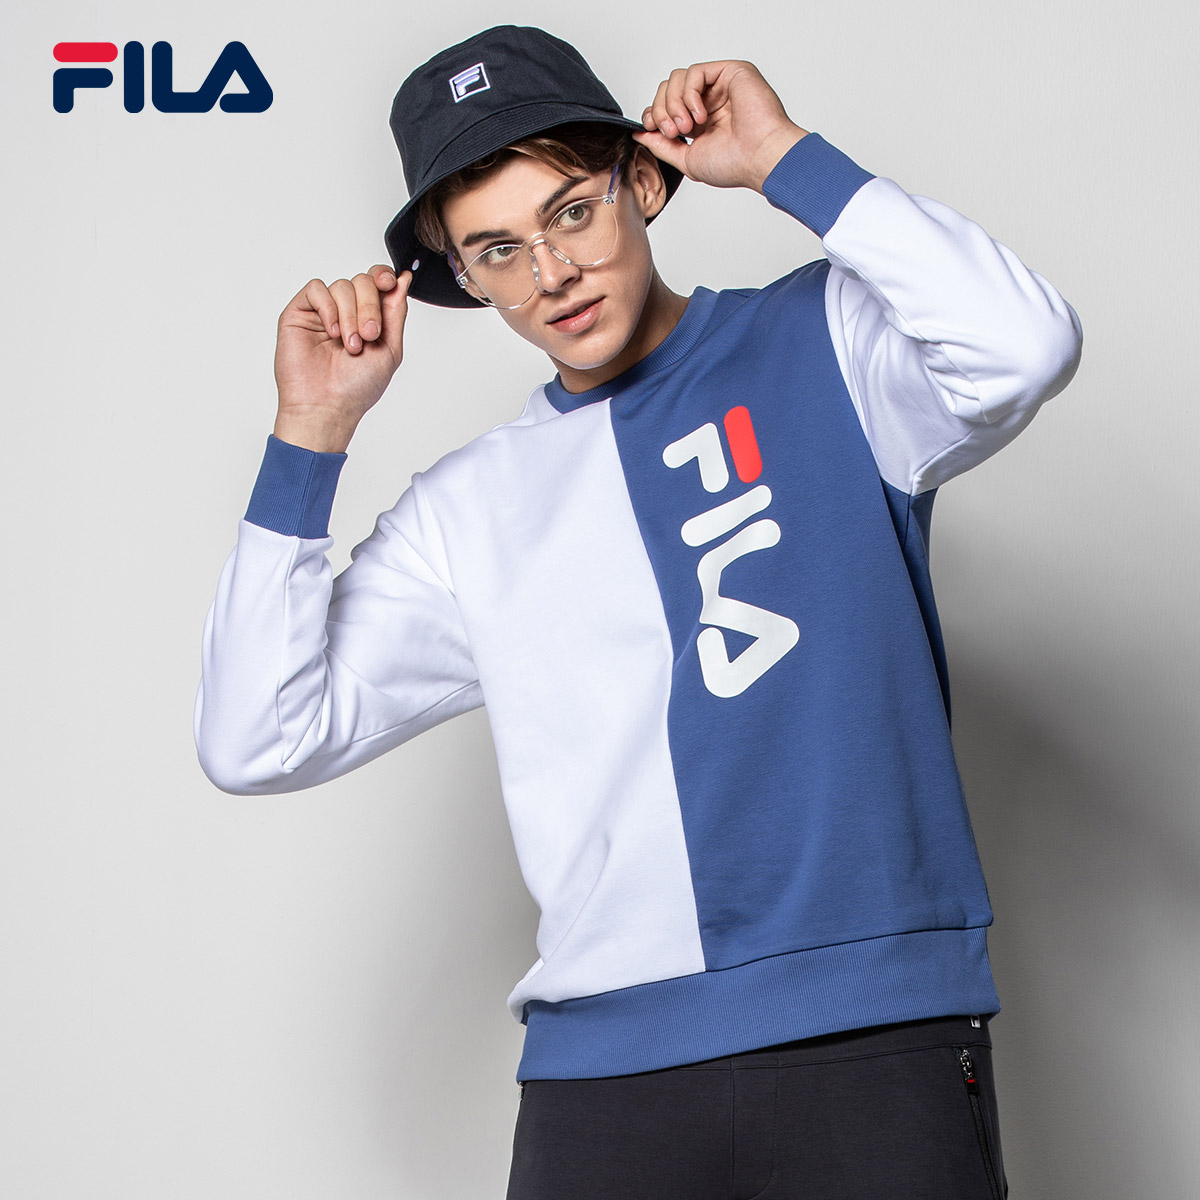 FILA斐乐卫衣男女同款2018冬季新品休闲运动上衣撞色套头衫男女